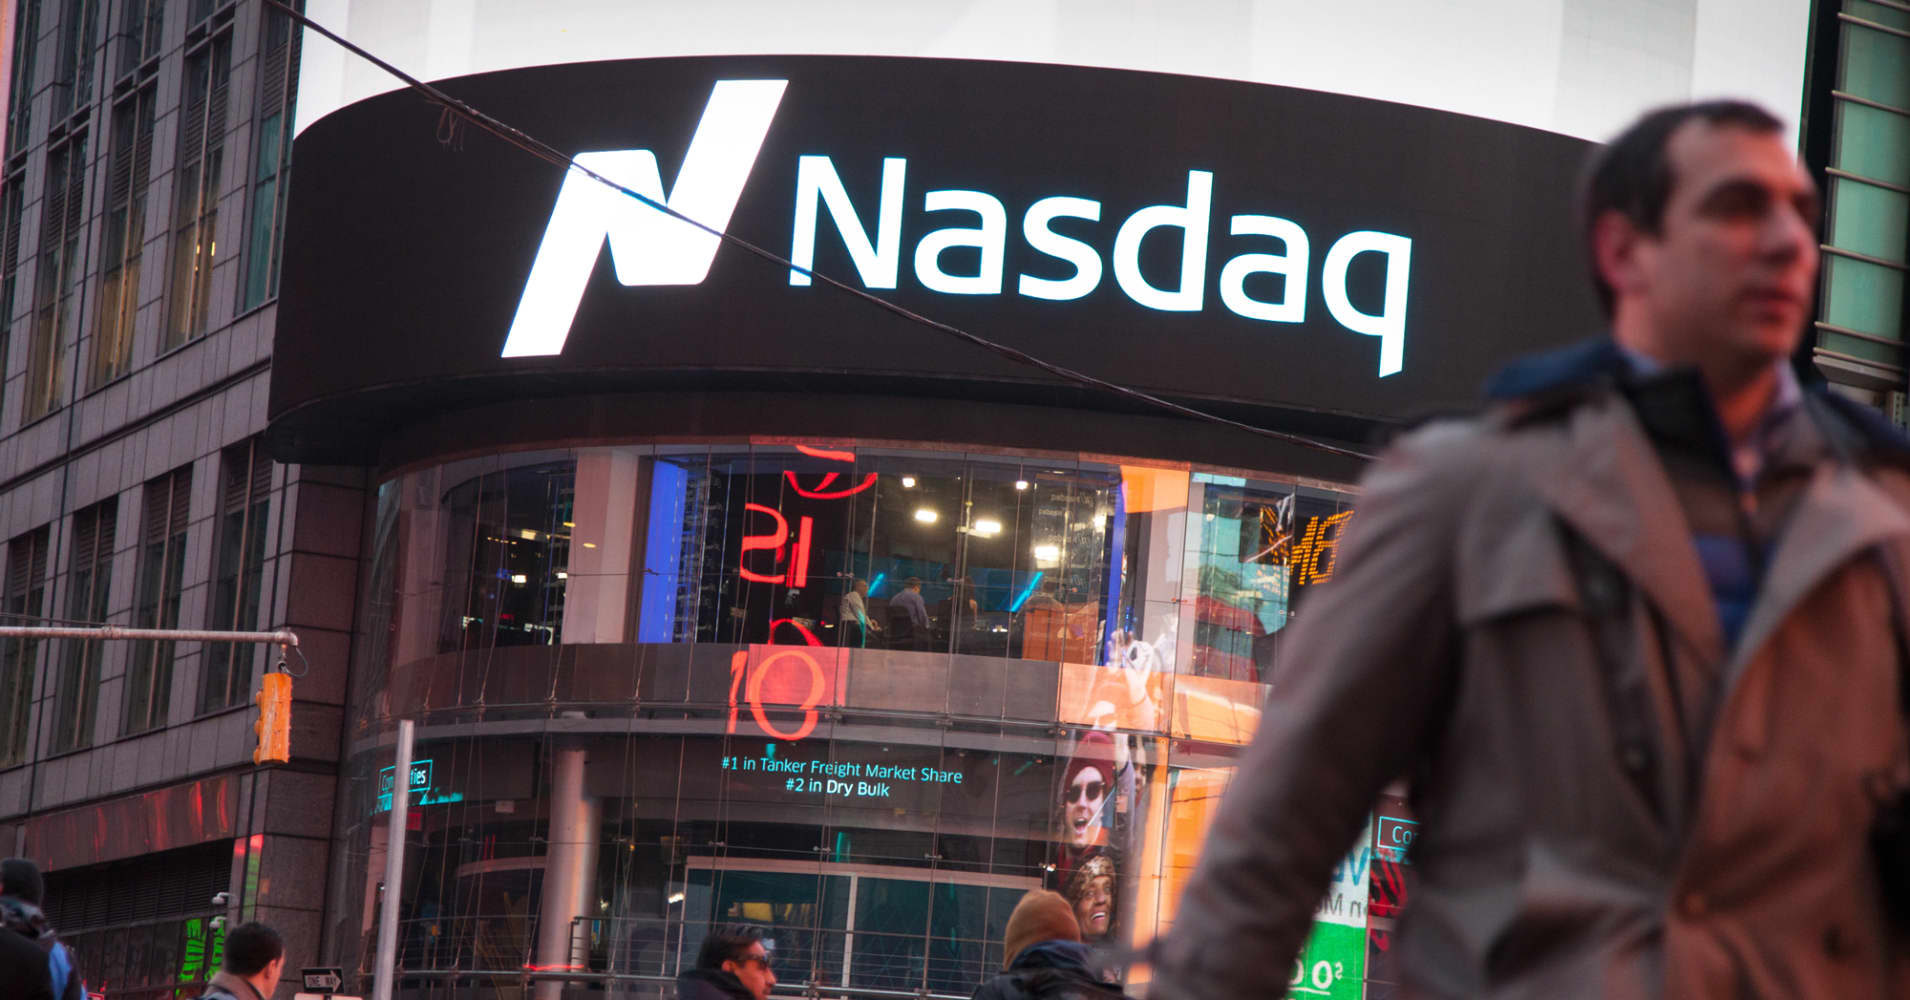 Nasdaq plows ahead to launch bitcoin futures despite cryptocurrencies' bear market